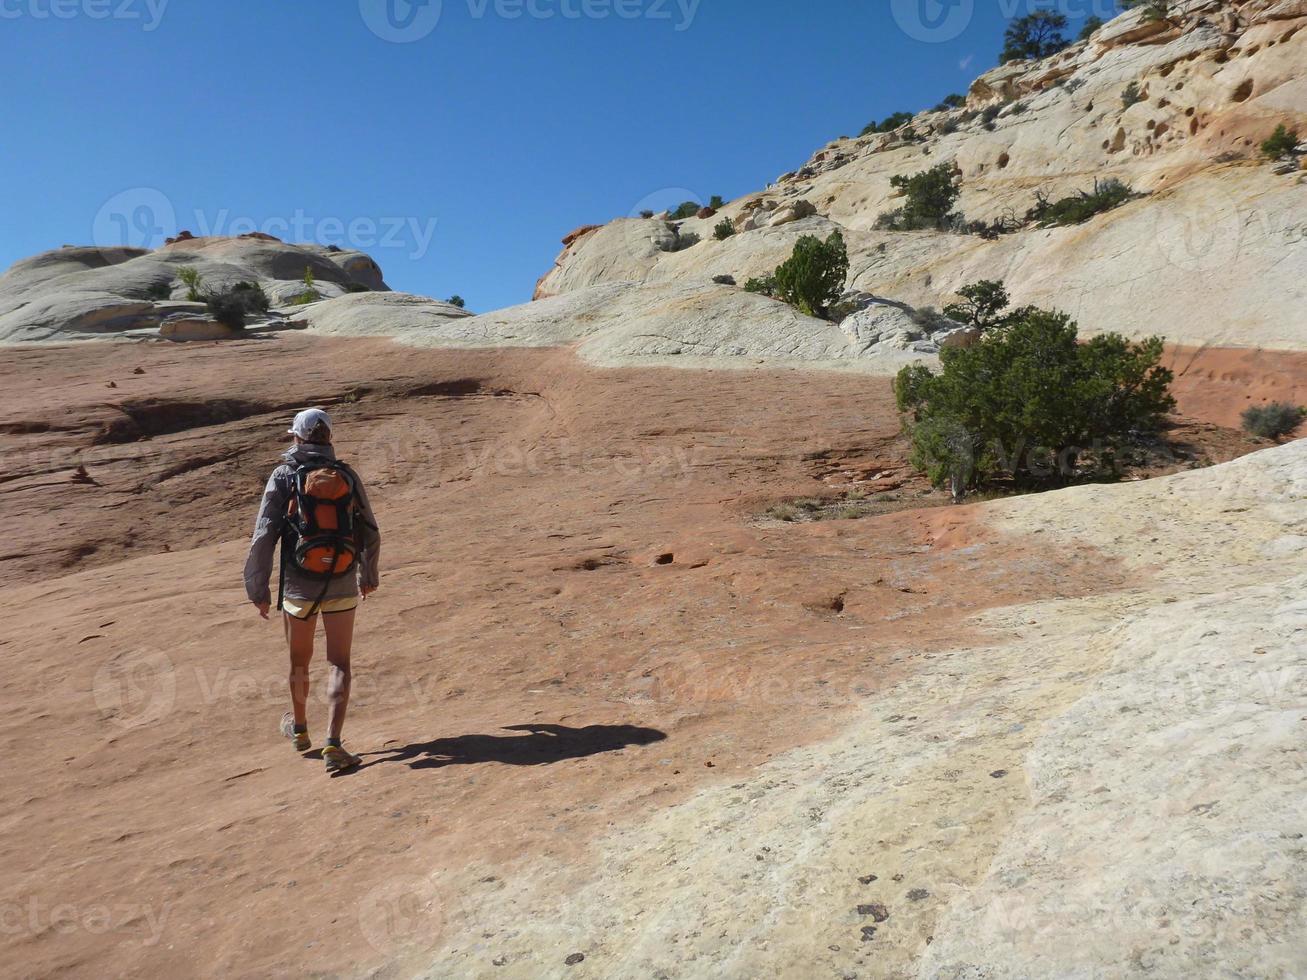 Woman hiking on desert slickrock photo